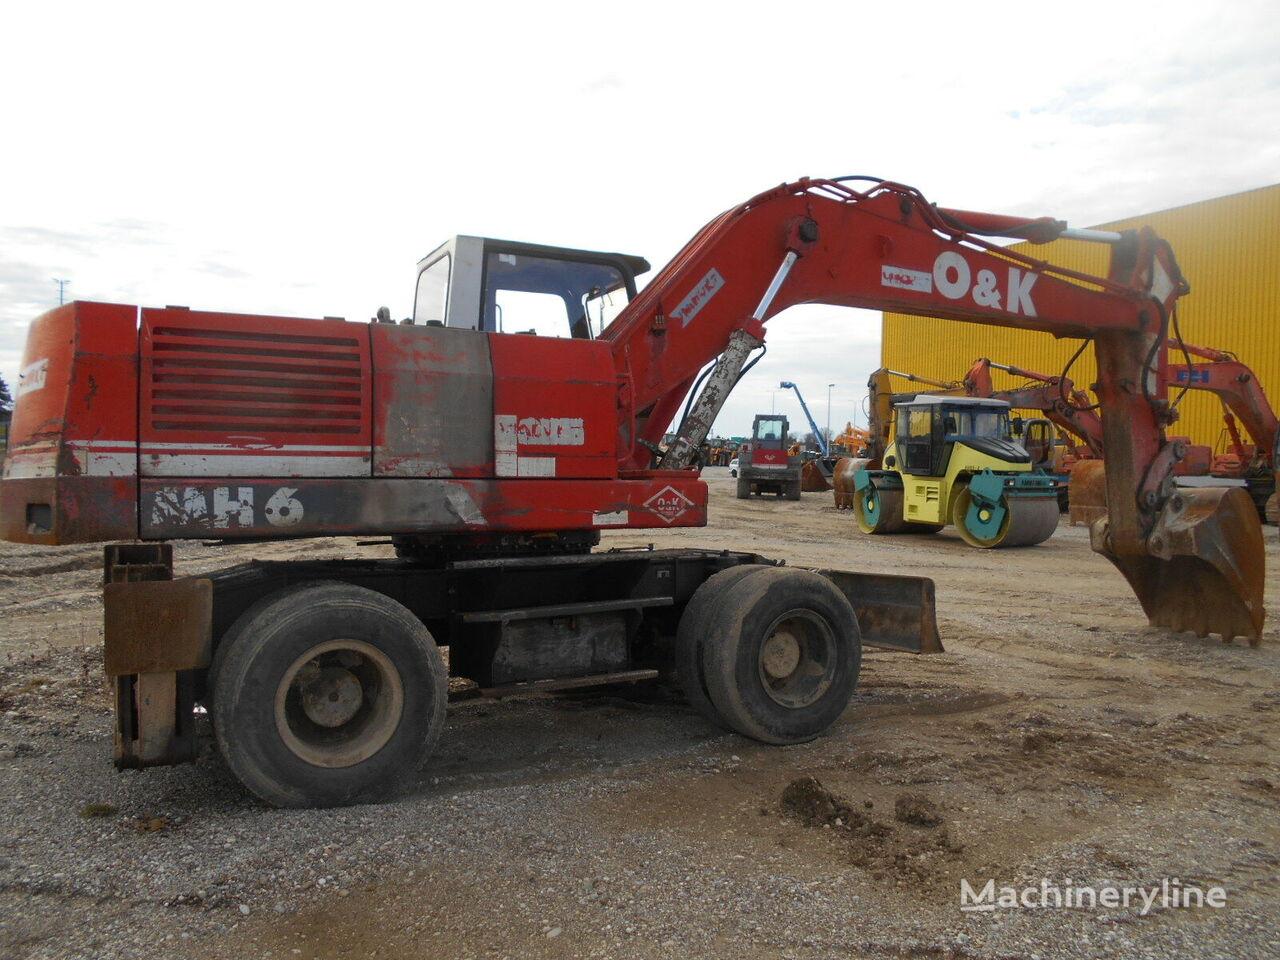 O&K MH-6 PLA/A2 wheel excavator